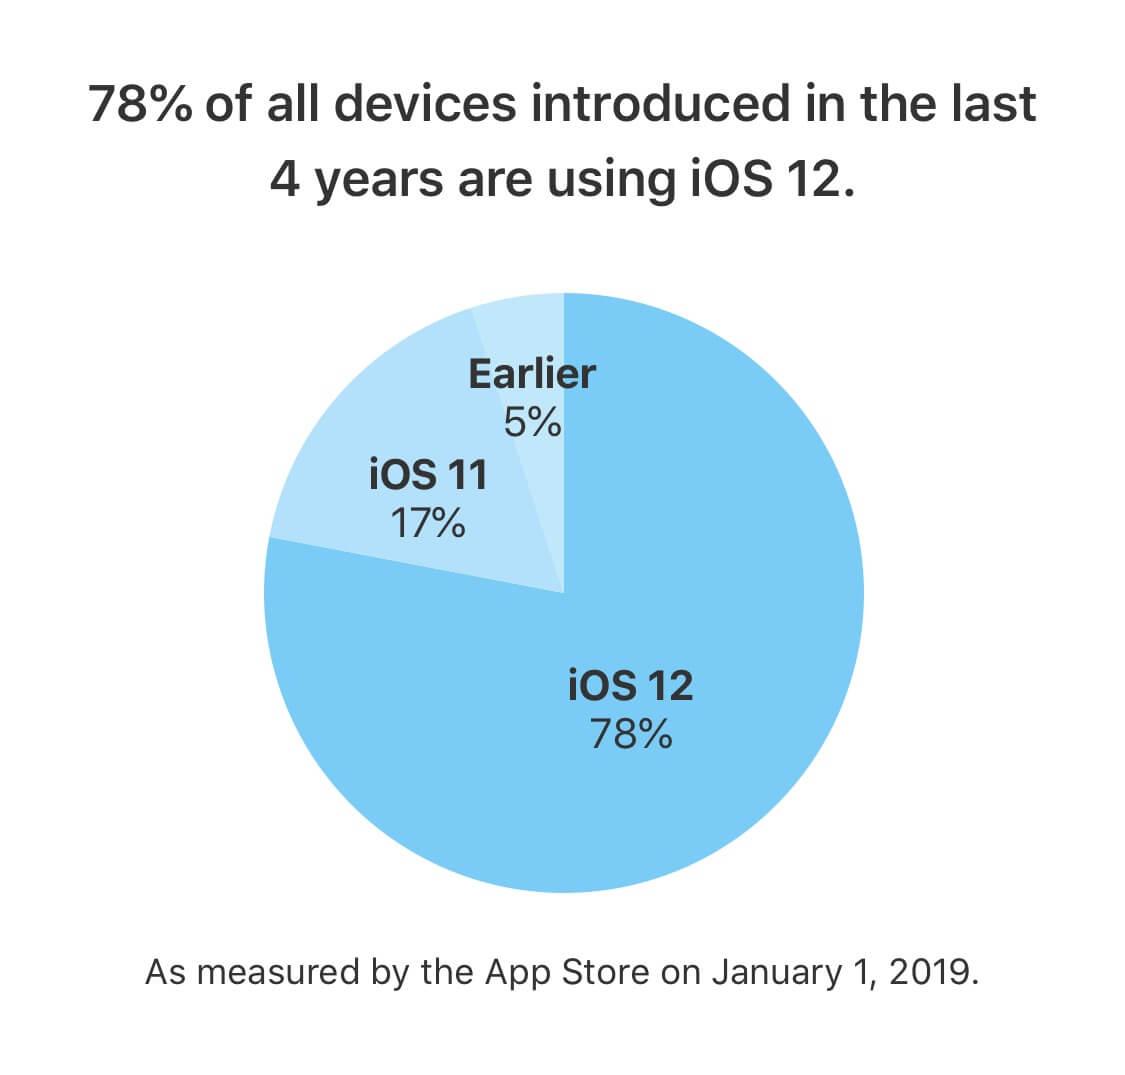 iOS 12 Verbreitung 01 2019 - Apple